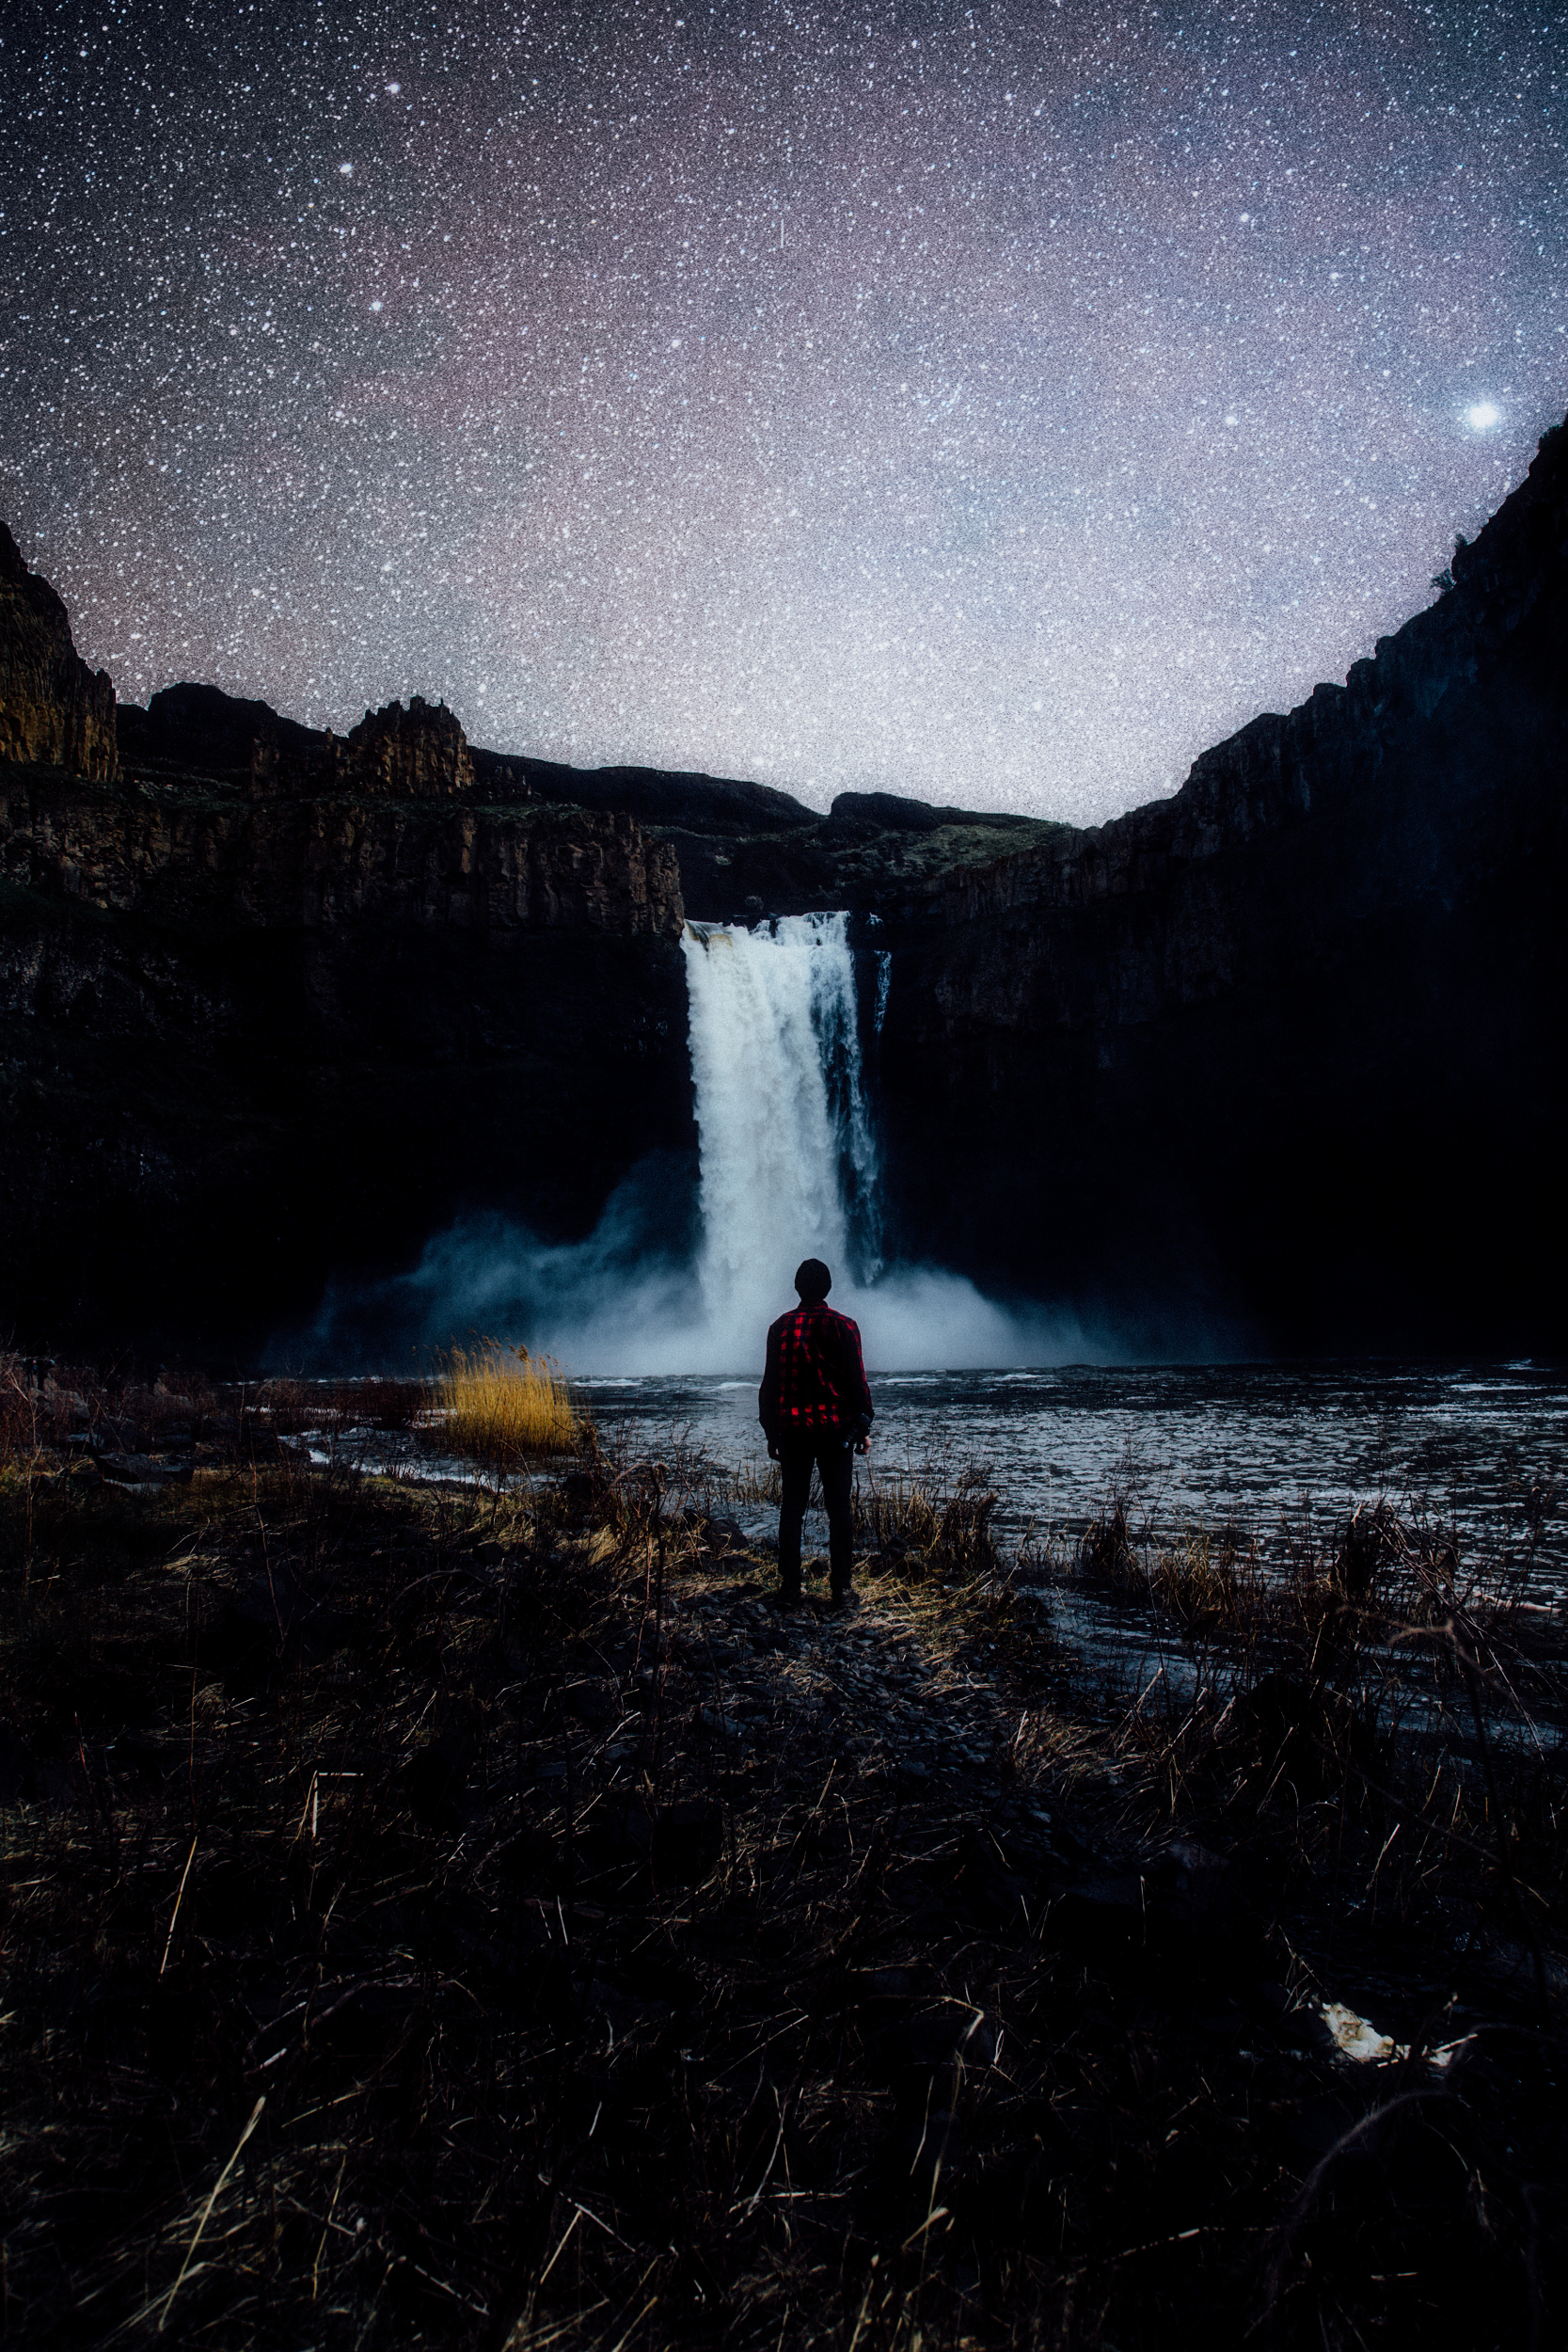 stars and waterfall